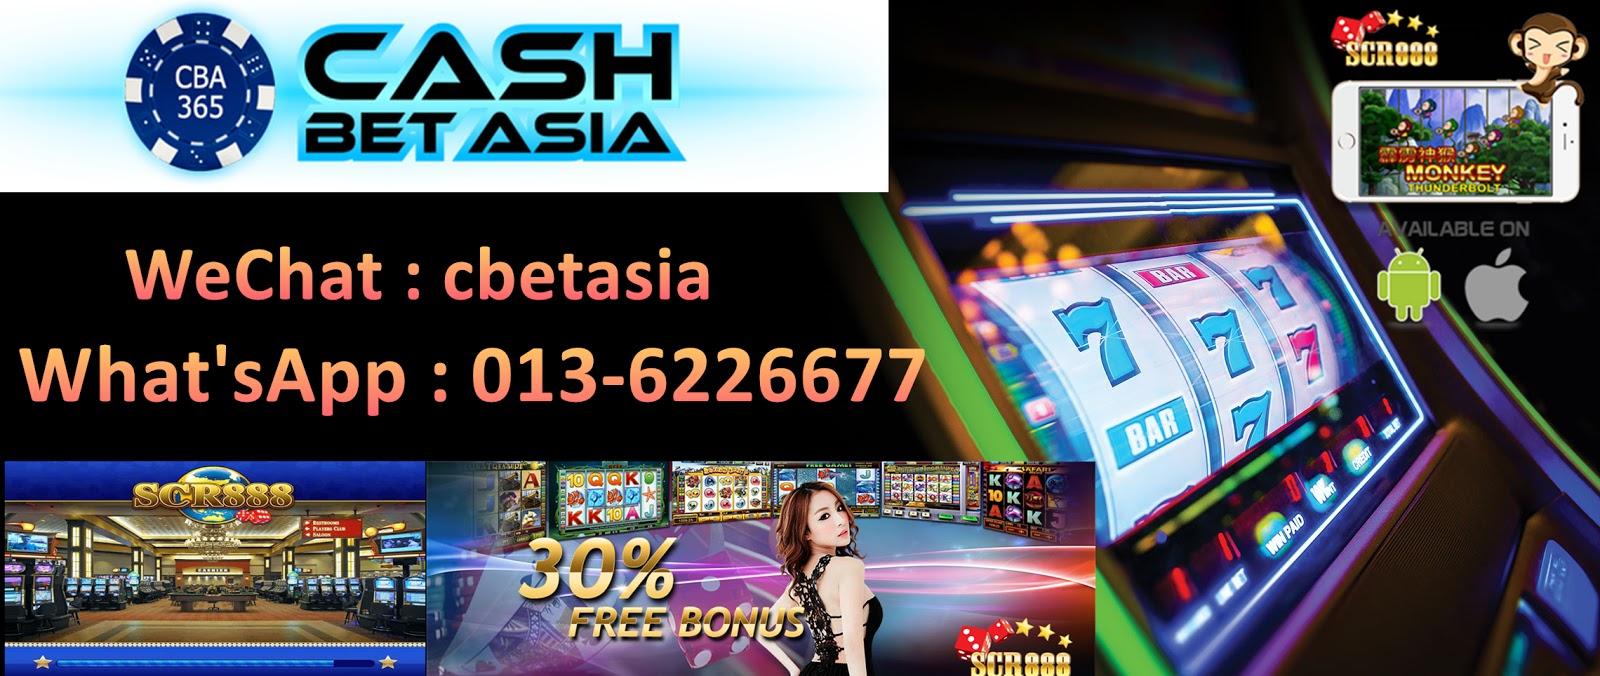 free casino slots games no downloads no registration